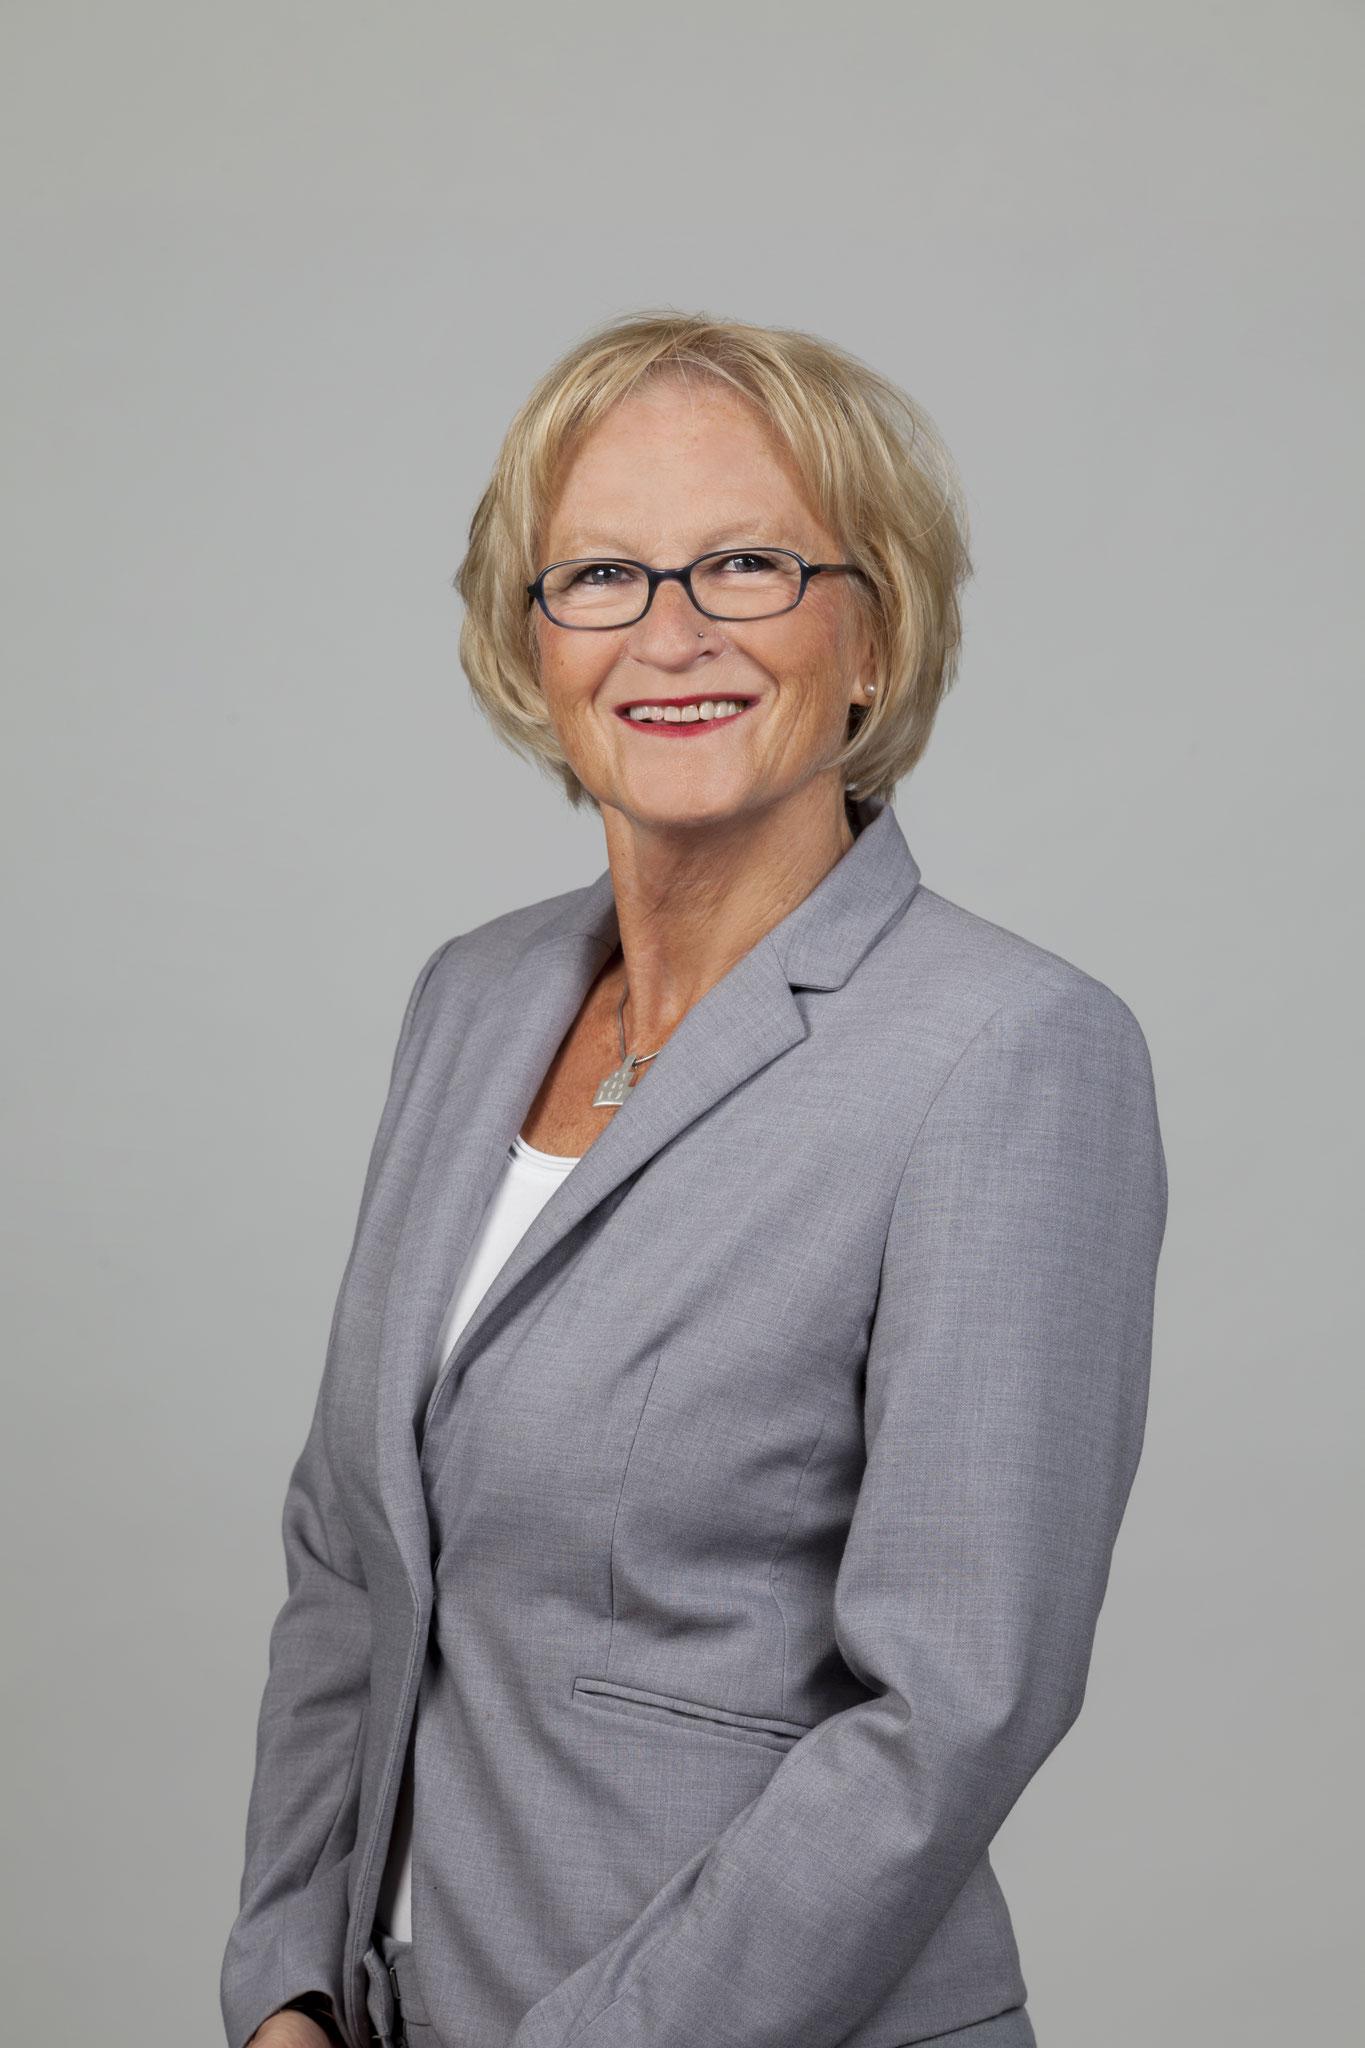 Rose-Marie Ebeling